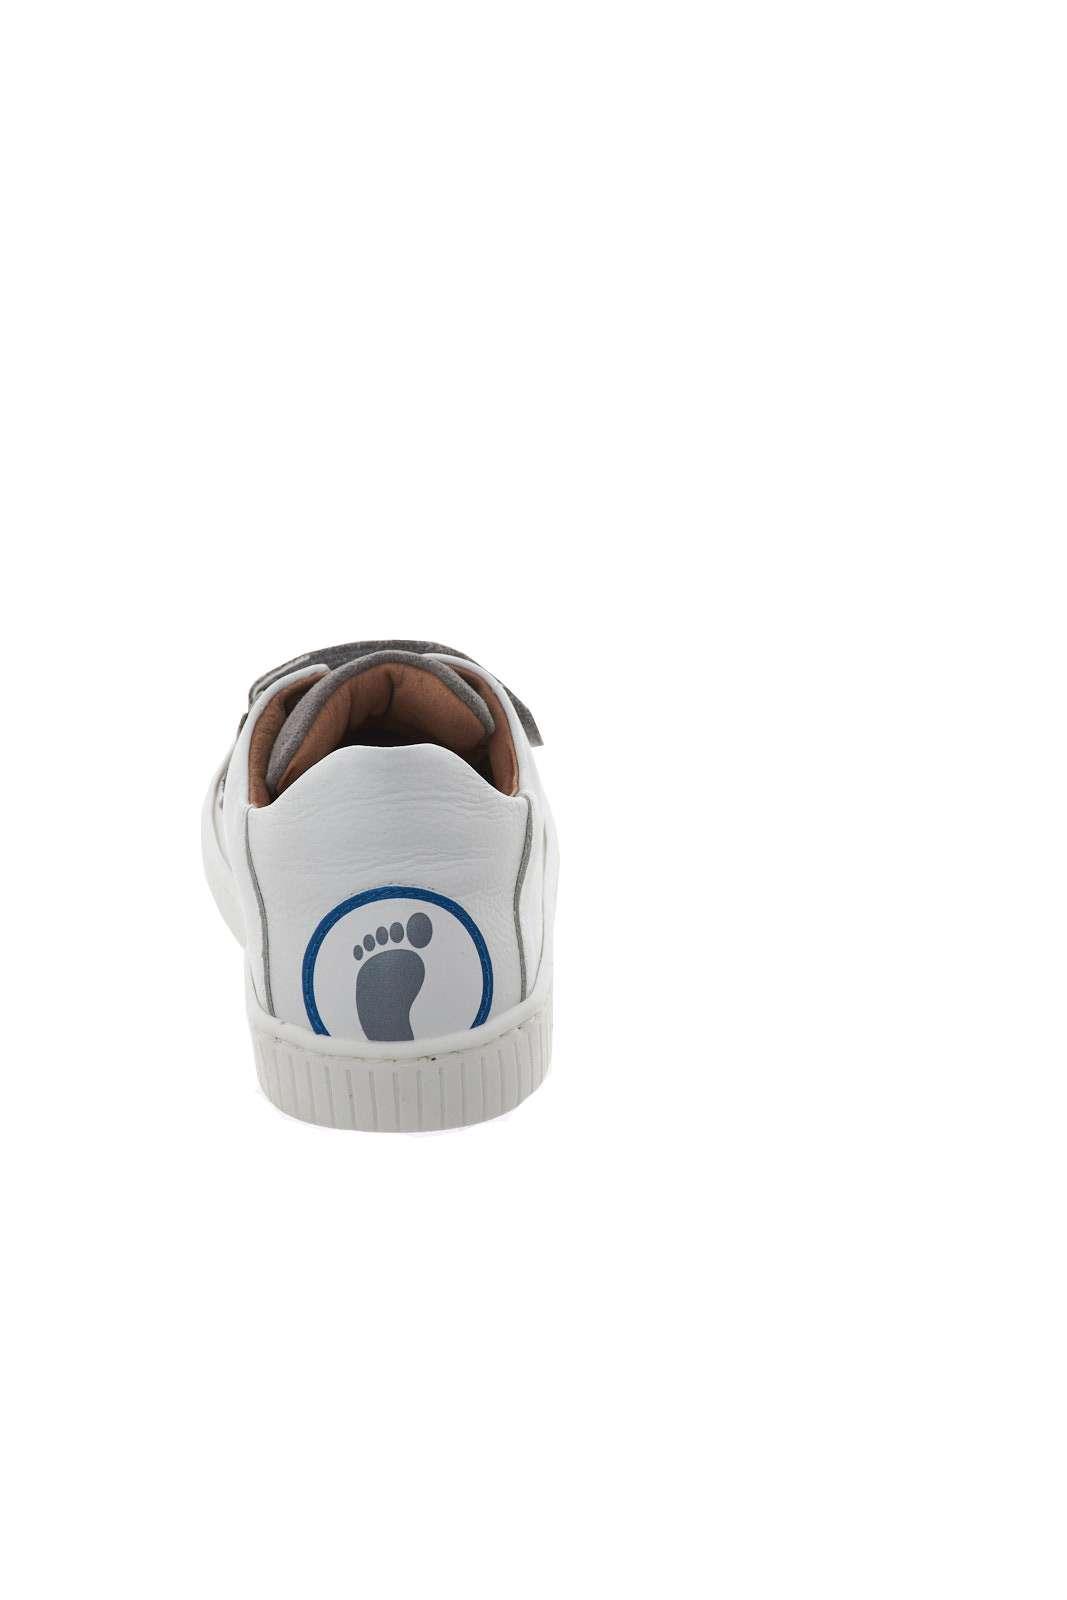 https://www.parmax.com/media/catalog/product/A/I/AI-outlet_parmax-sneaker-bambino-Walkey-Piccoli-Passi-Y1B440060-D_1.jpg